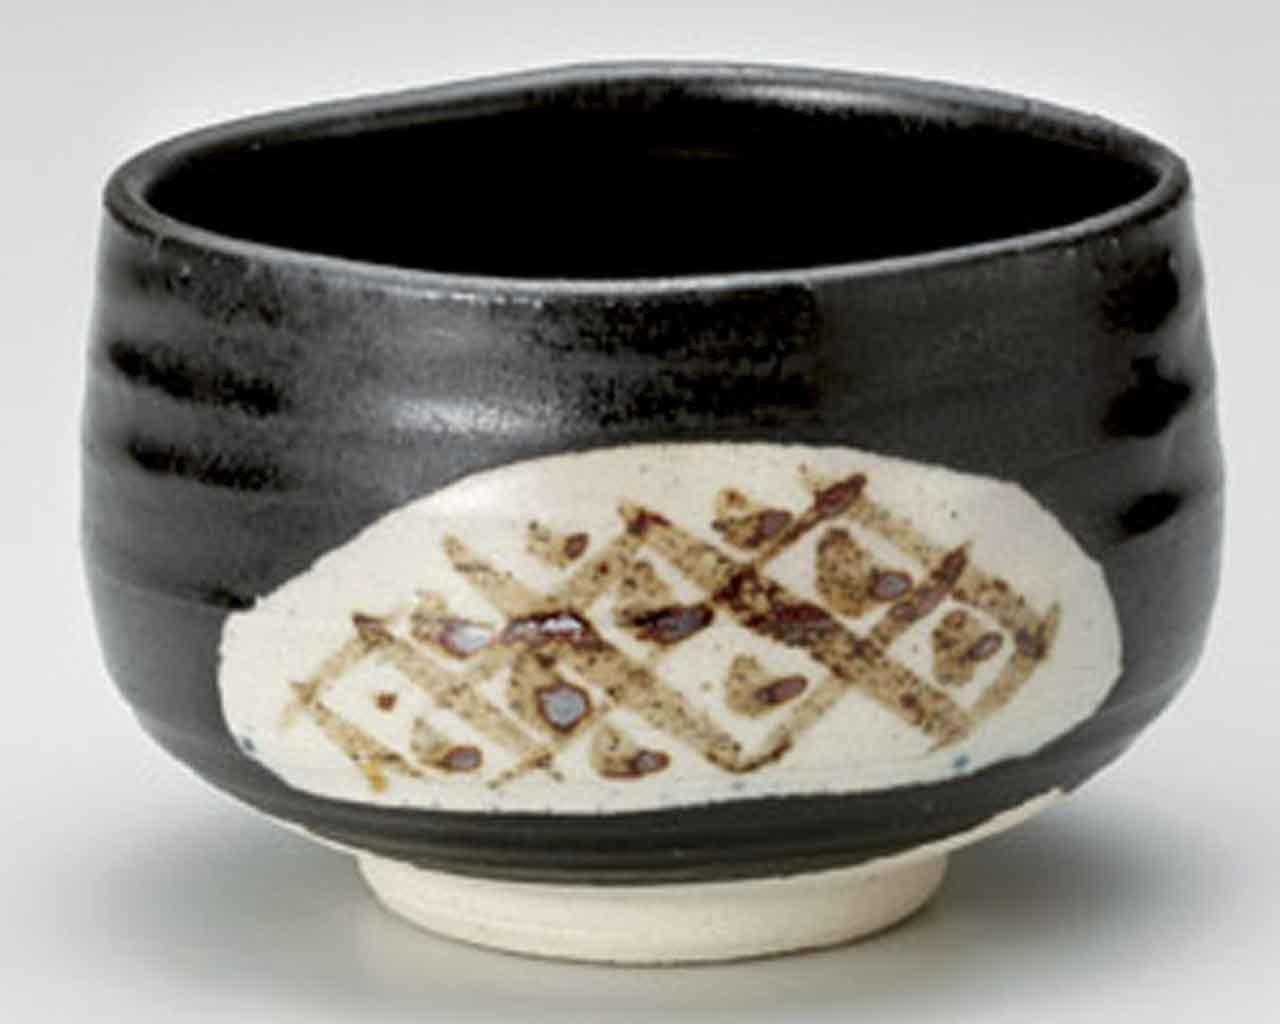 Shino Black 4.5inch Set of 2 Matcha-Bowls White Ceramic Made in Japan by Watou.asia